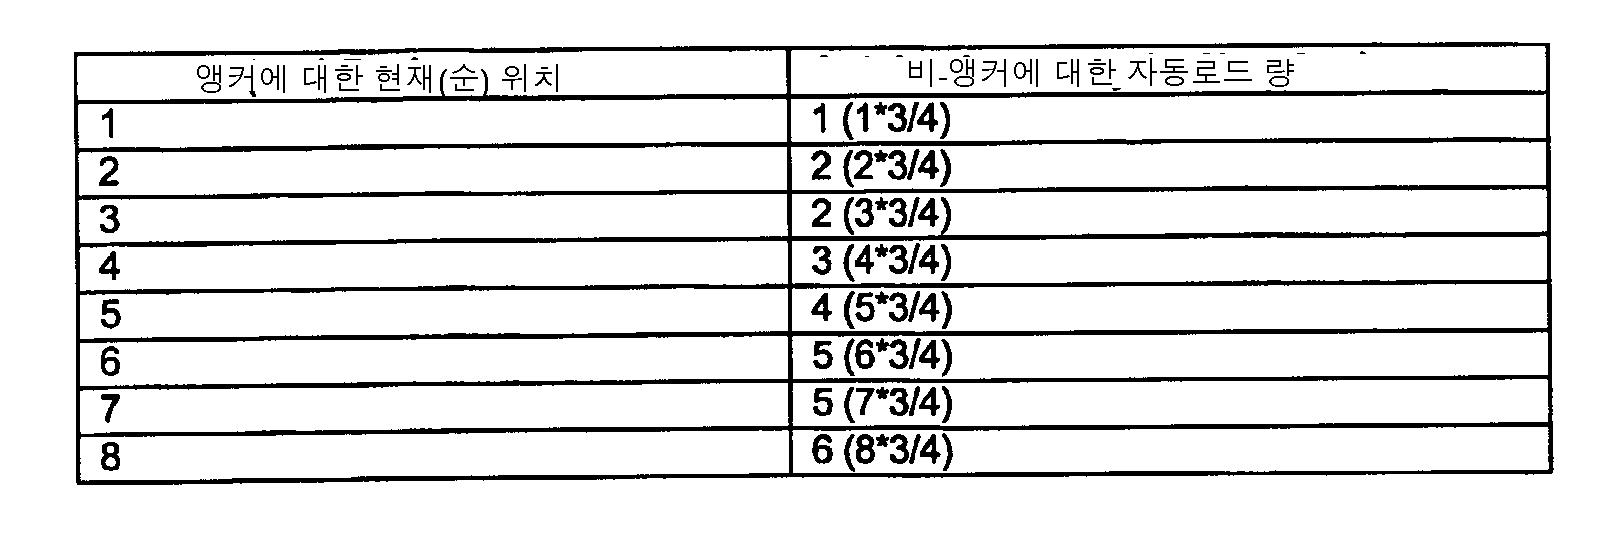 Figure 112003047670742-pct00001